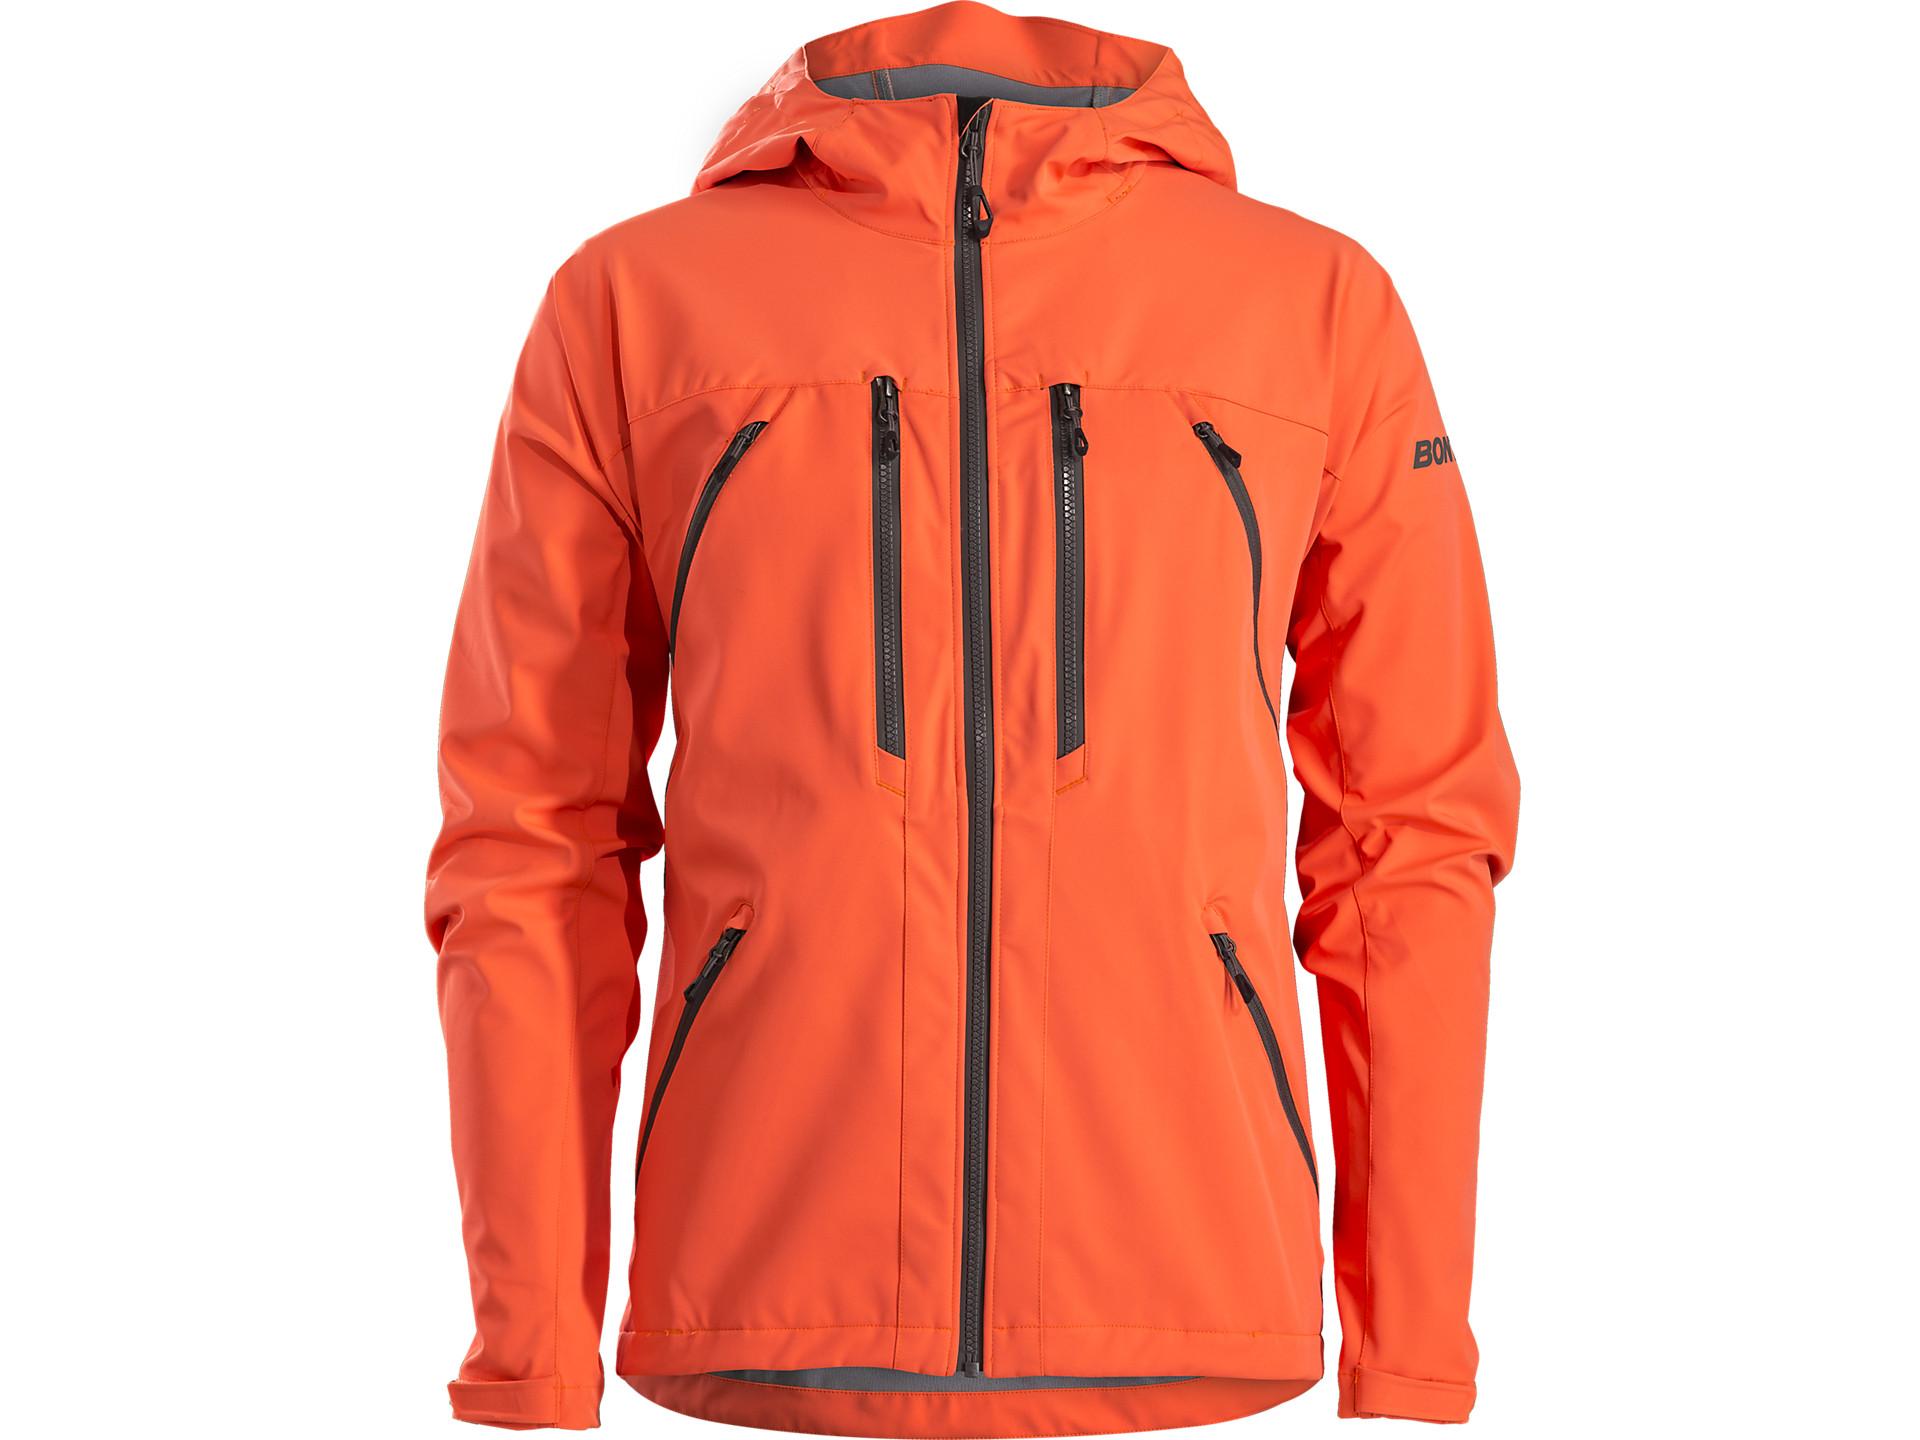 Bontrager OMW Softshell Mountain Bike Jacket 2dafc9903